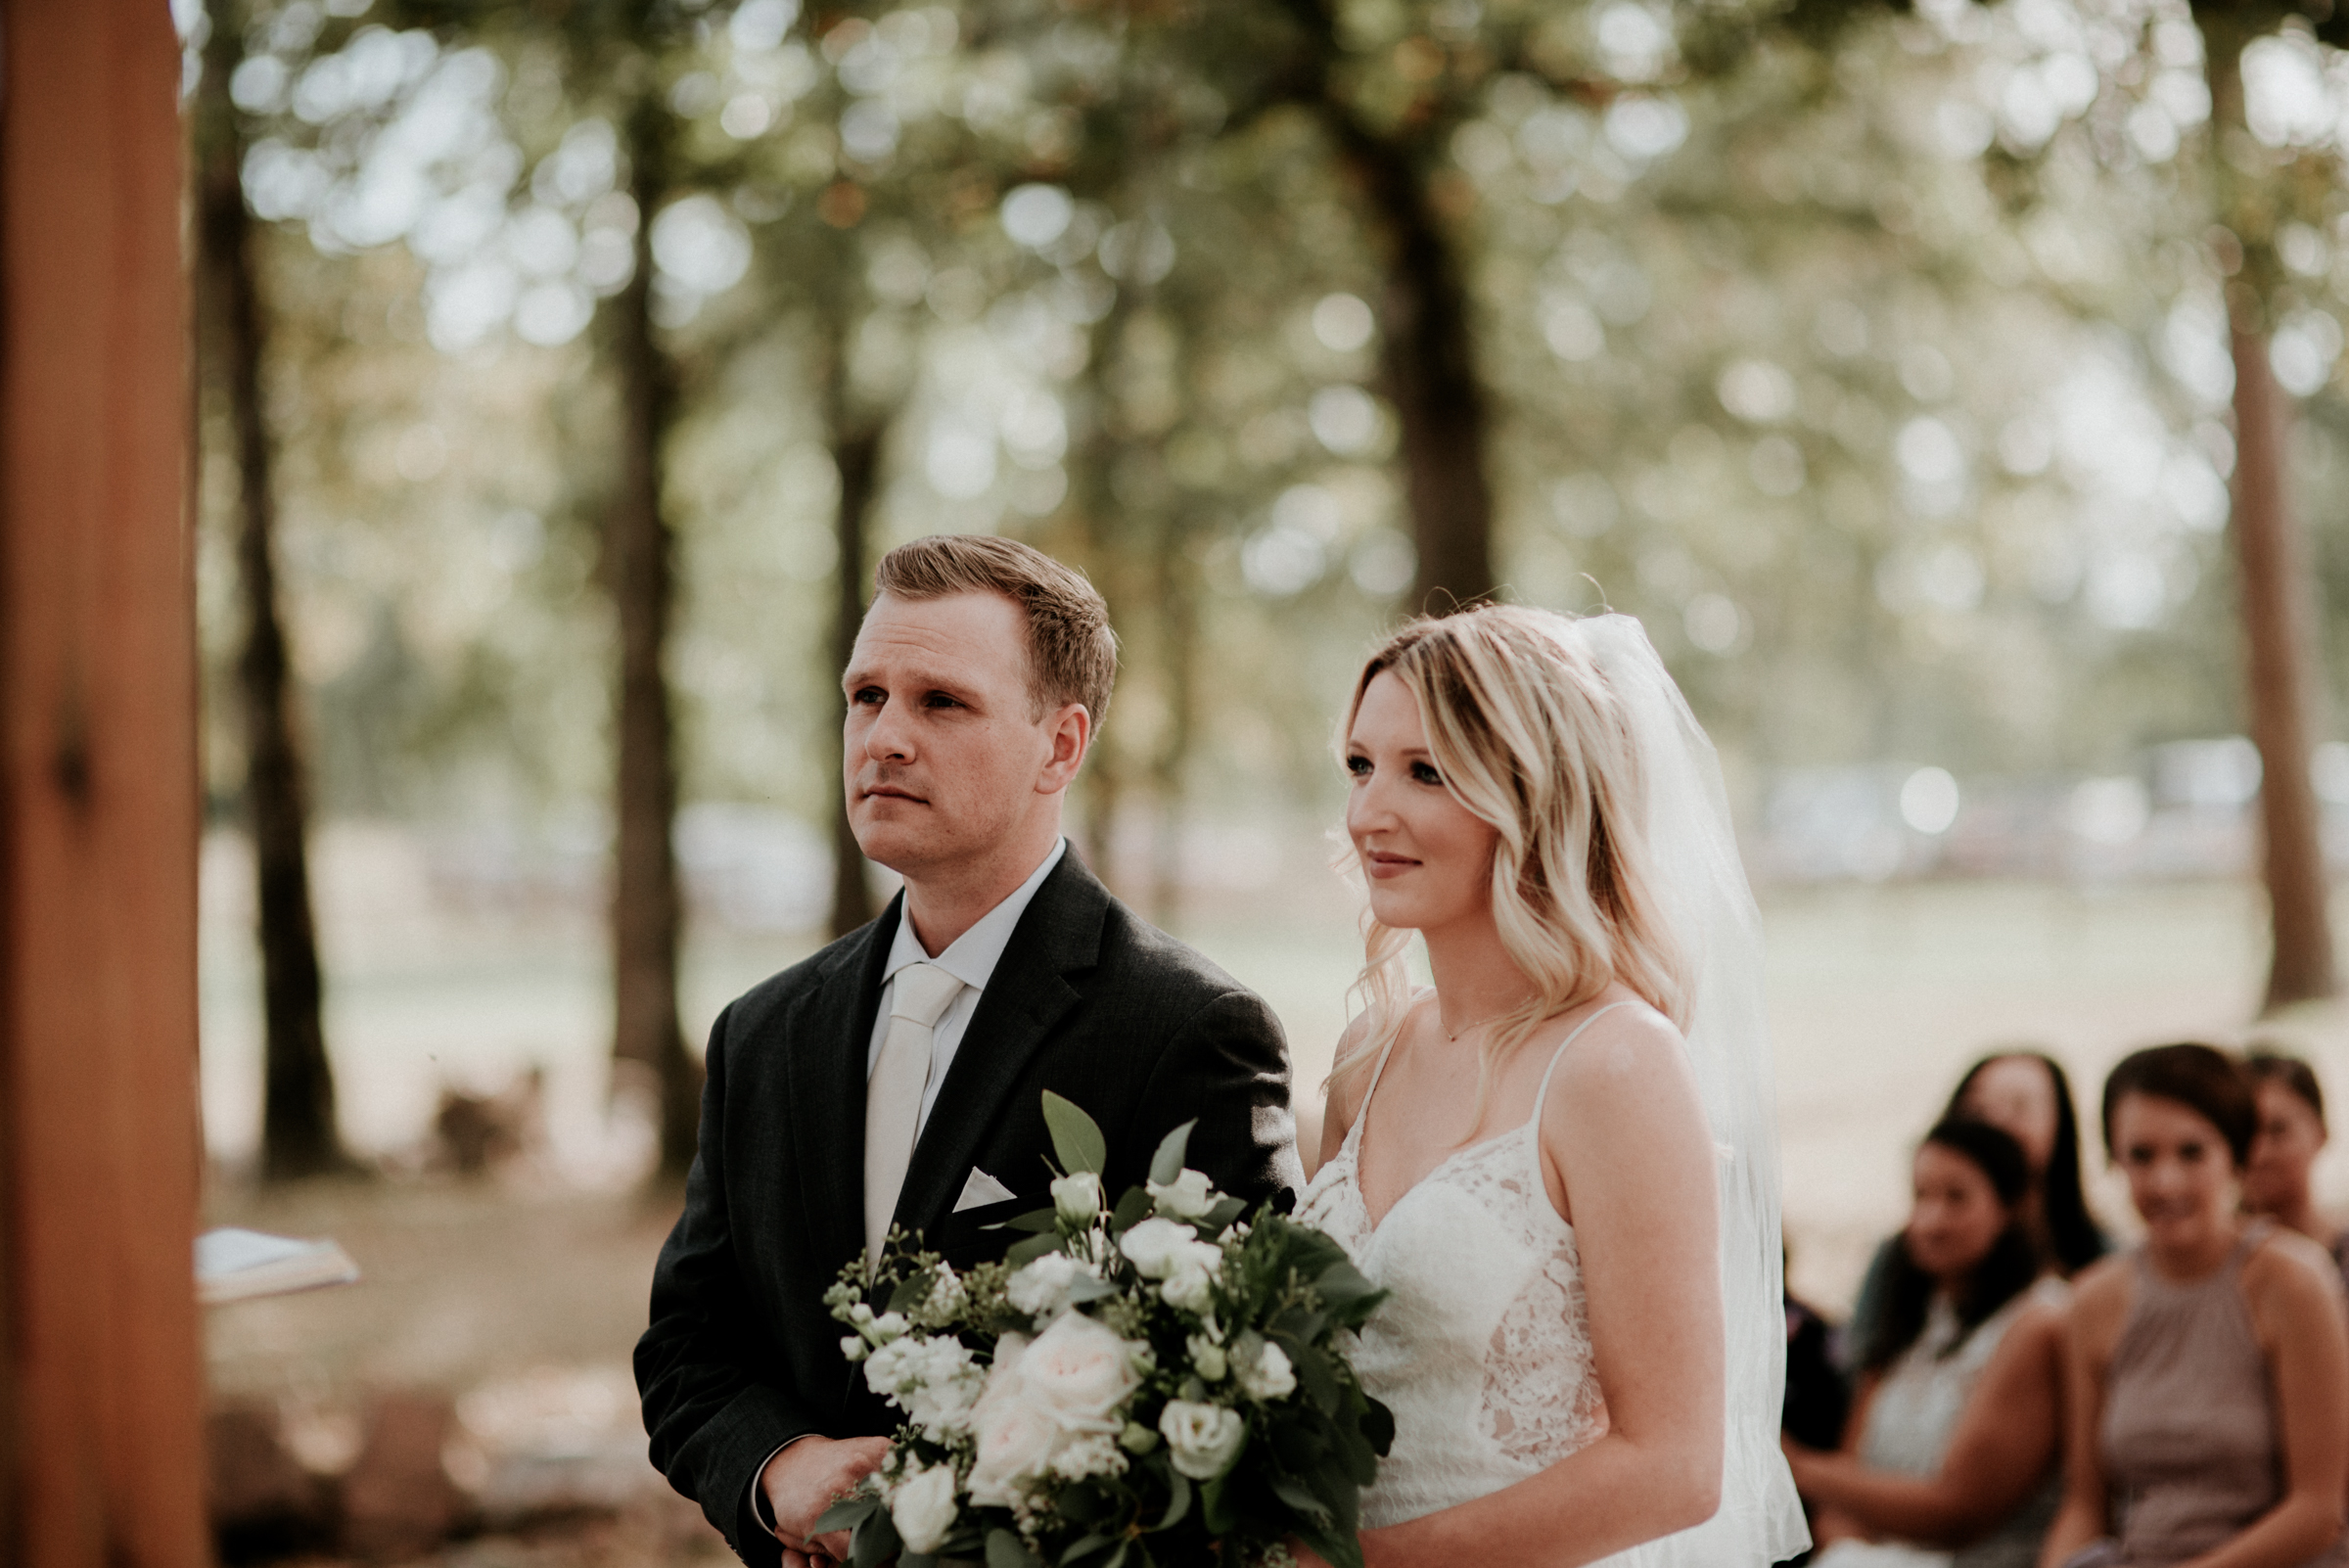 Zach&Rosalie Marion St. Louis Wedding Photographer-5205.jpg